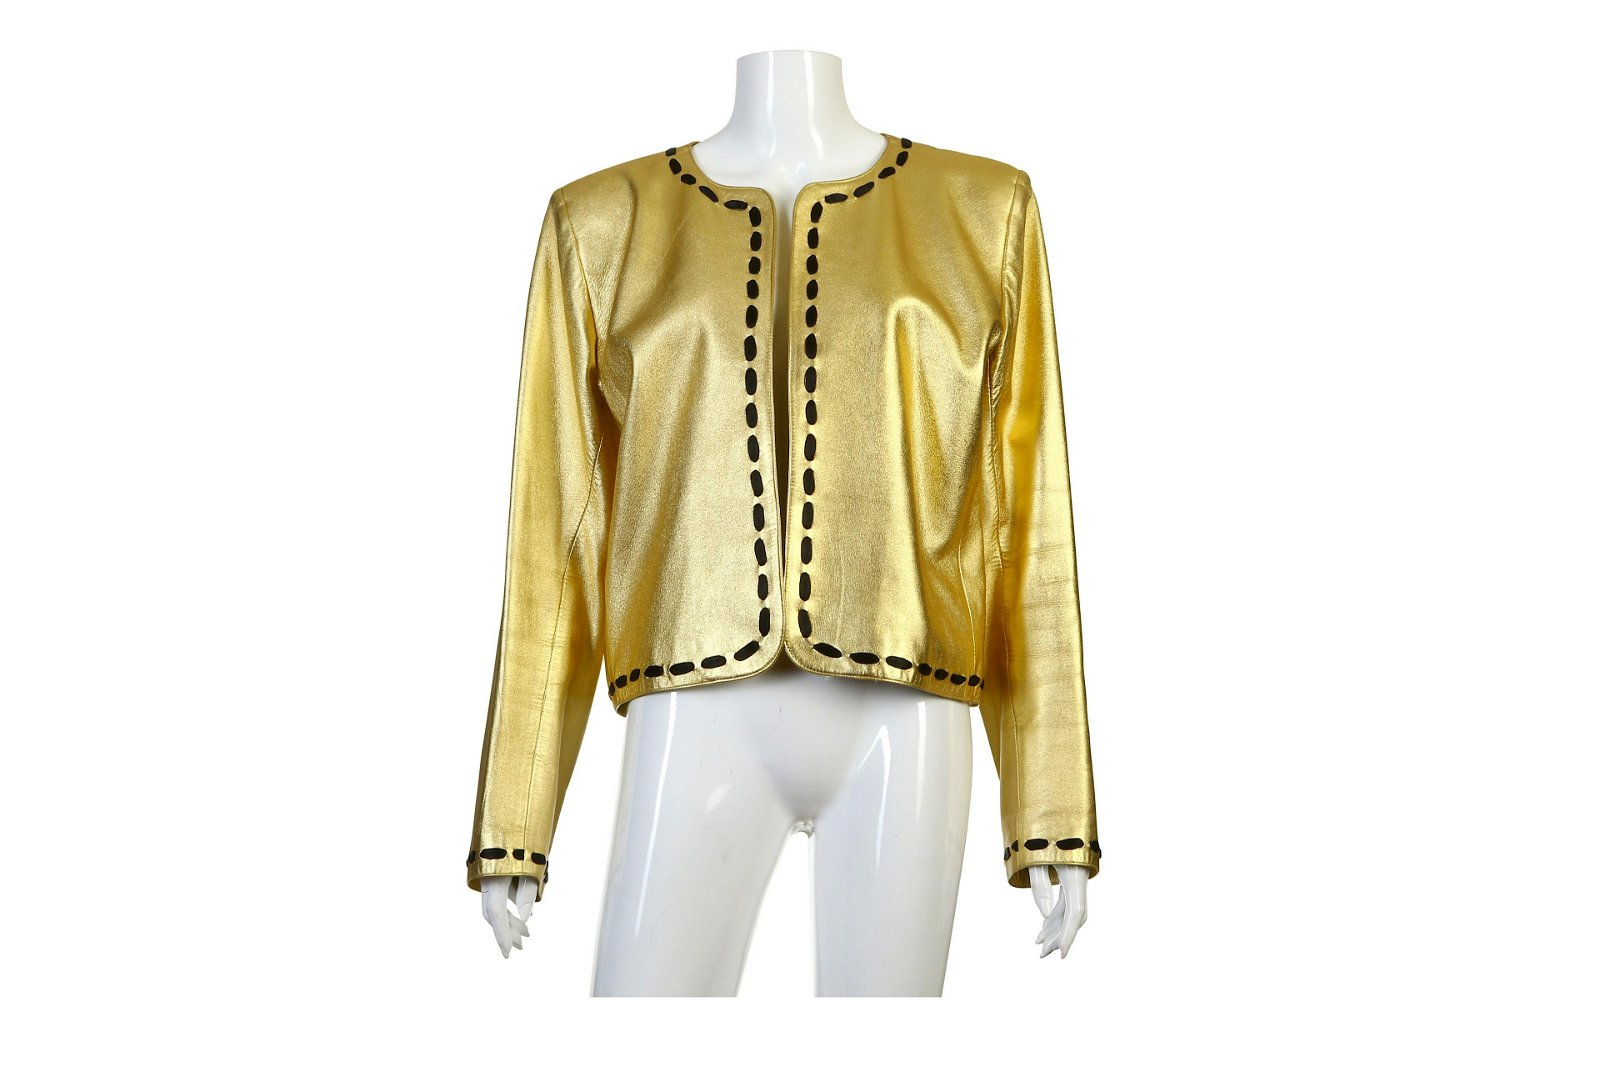 Yves Saint Laurent Gold Leather Jacket